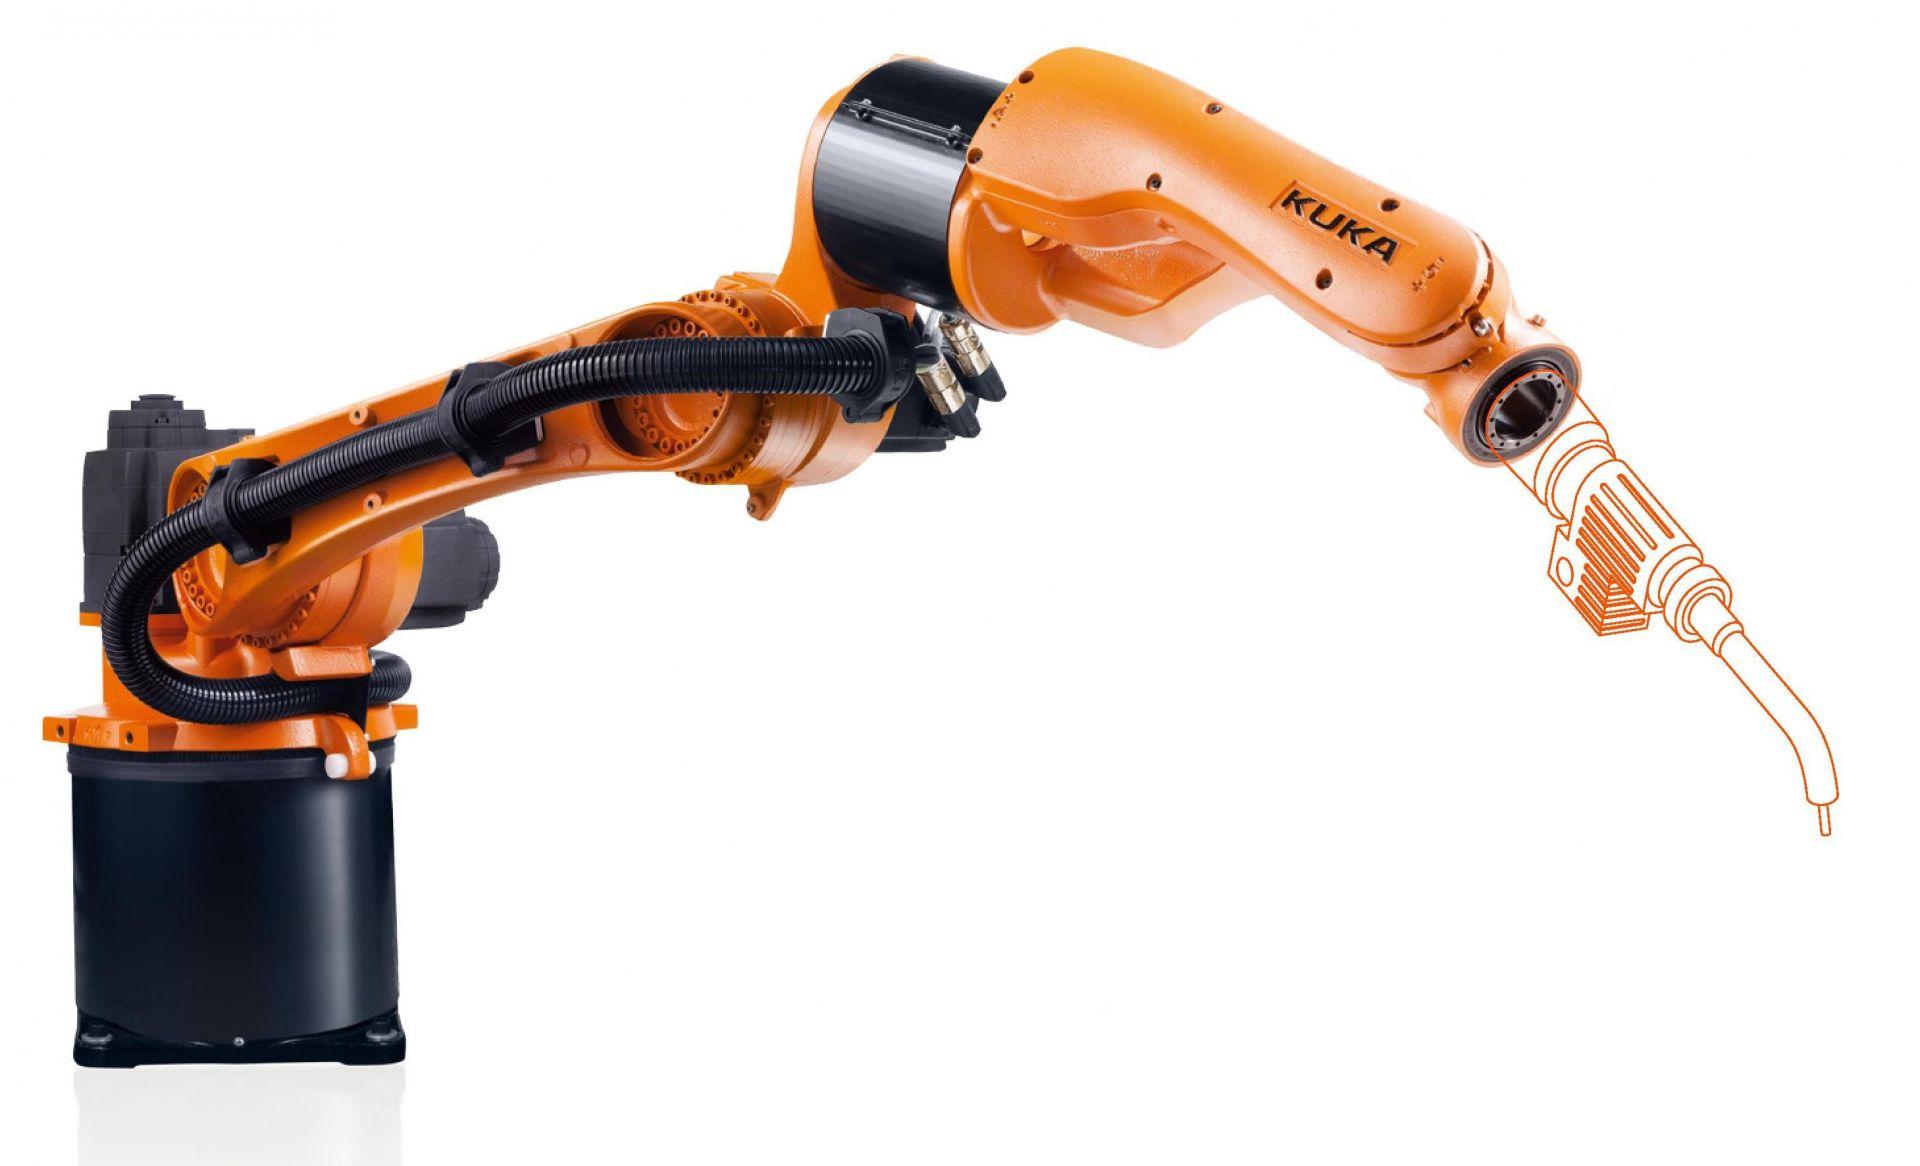 kuka kr cybertech arc nano used robot | Eurobots